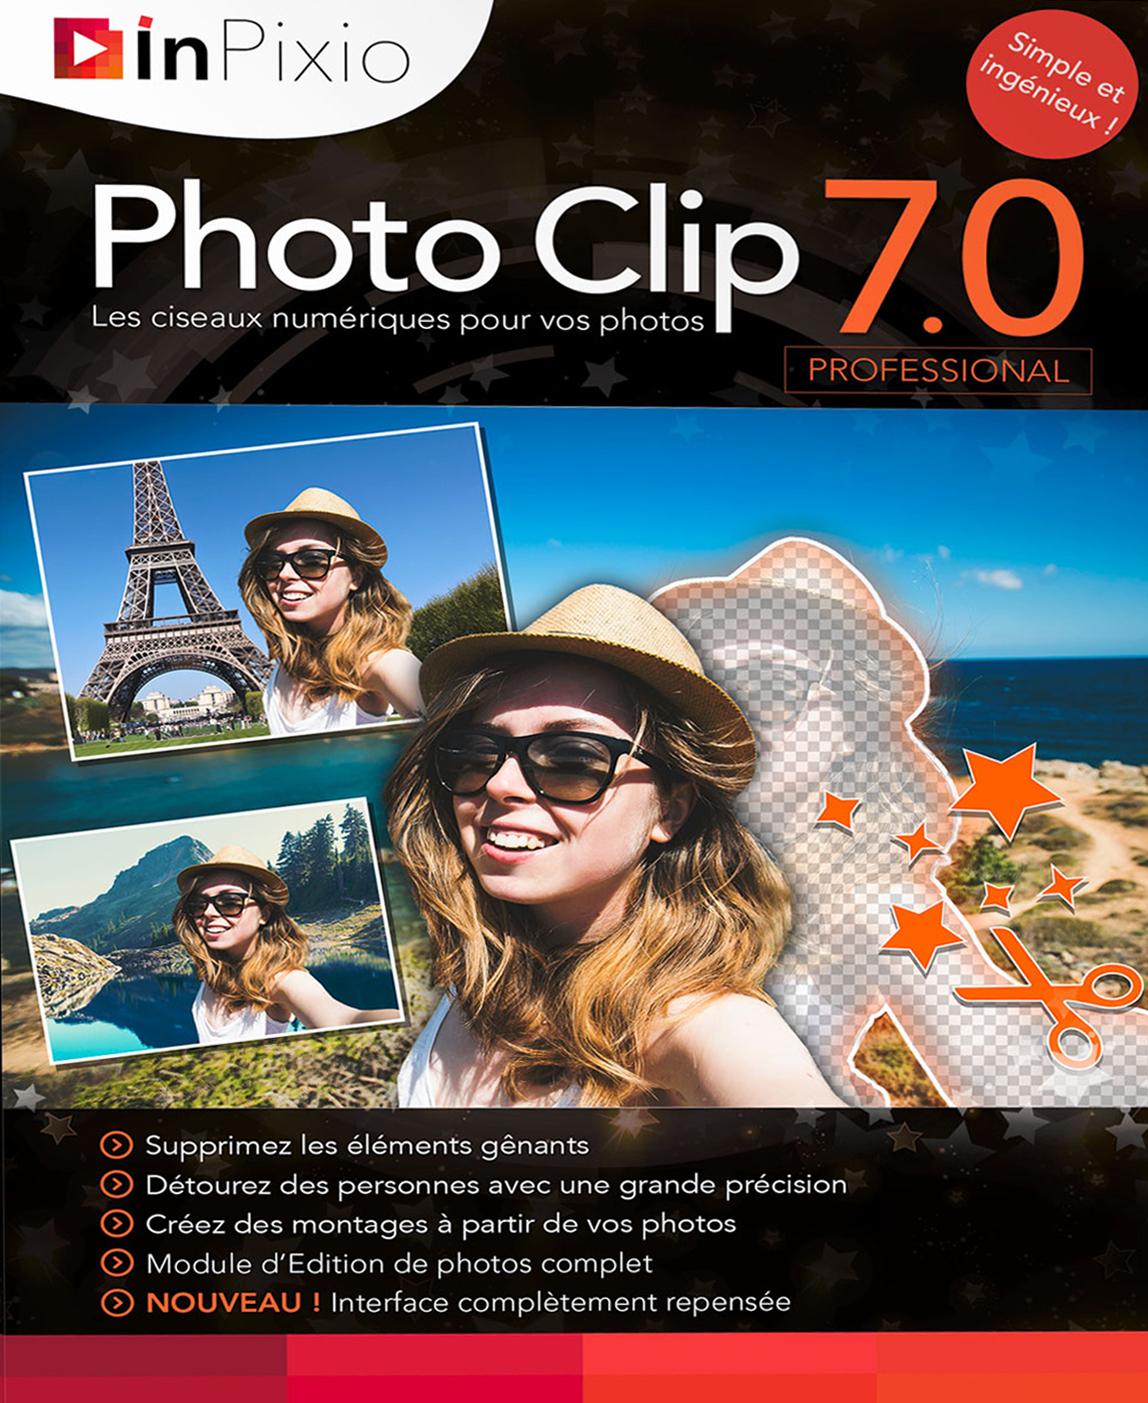 inpixio-photo-clip-70-professional-telechargement